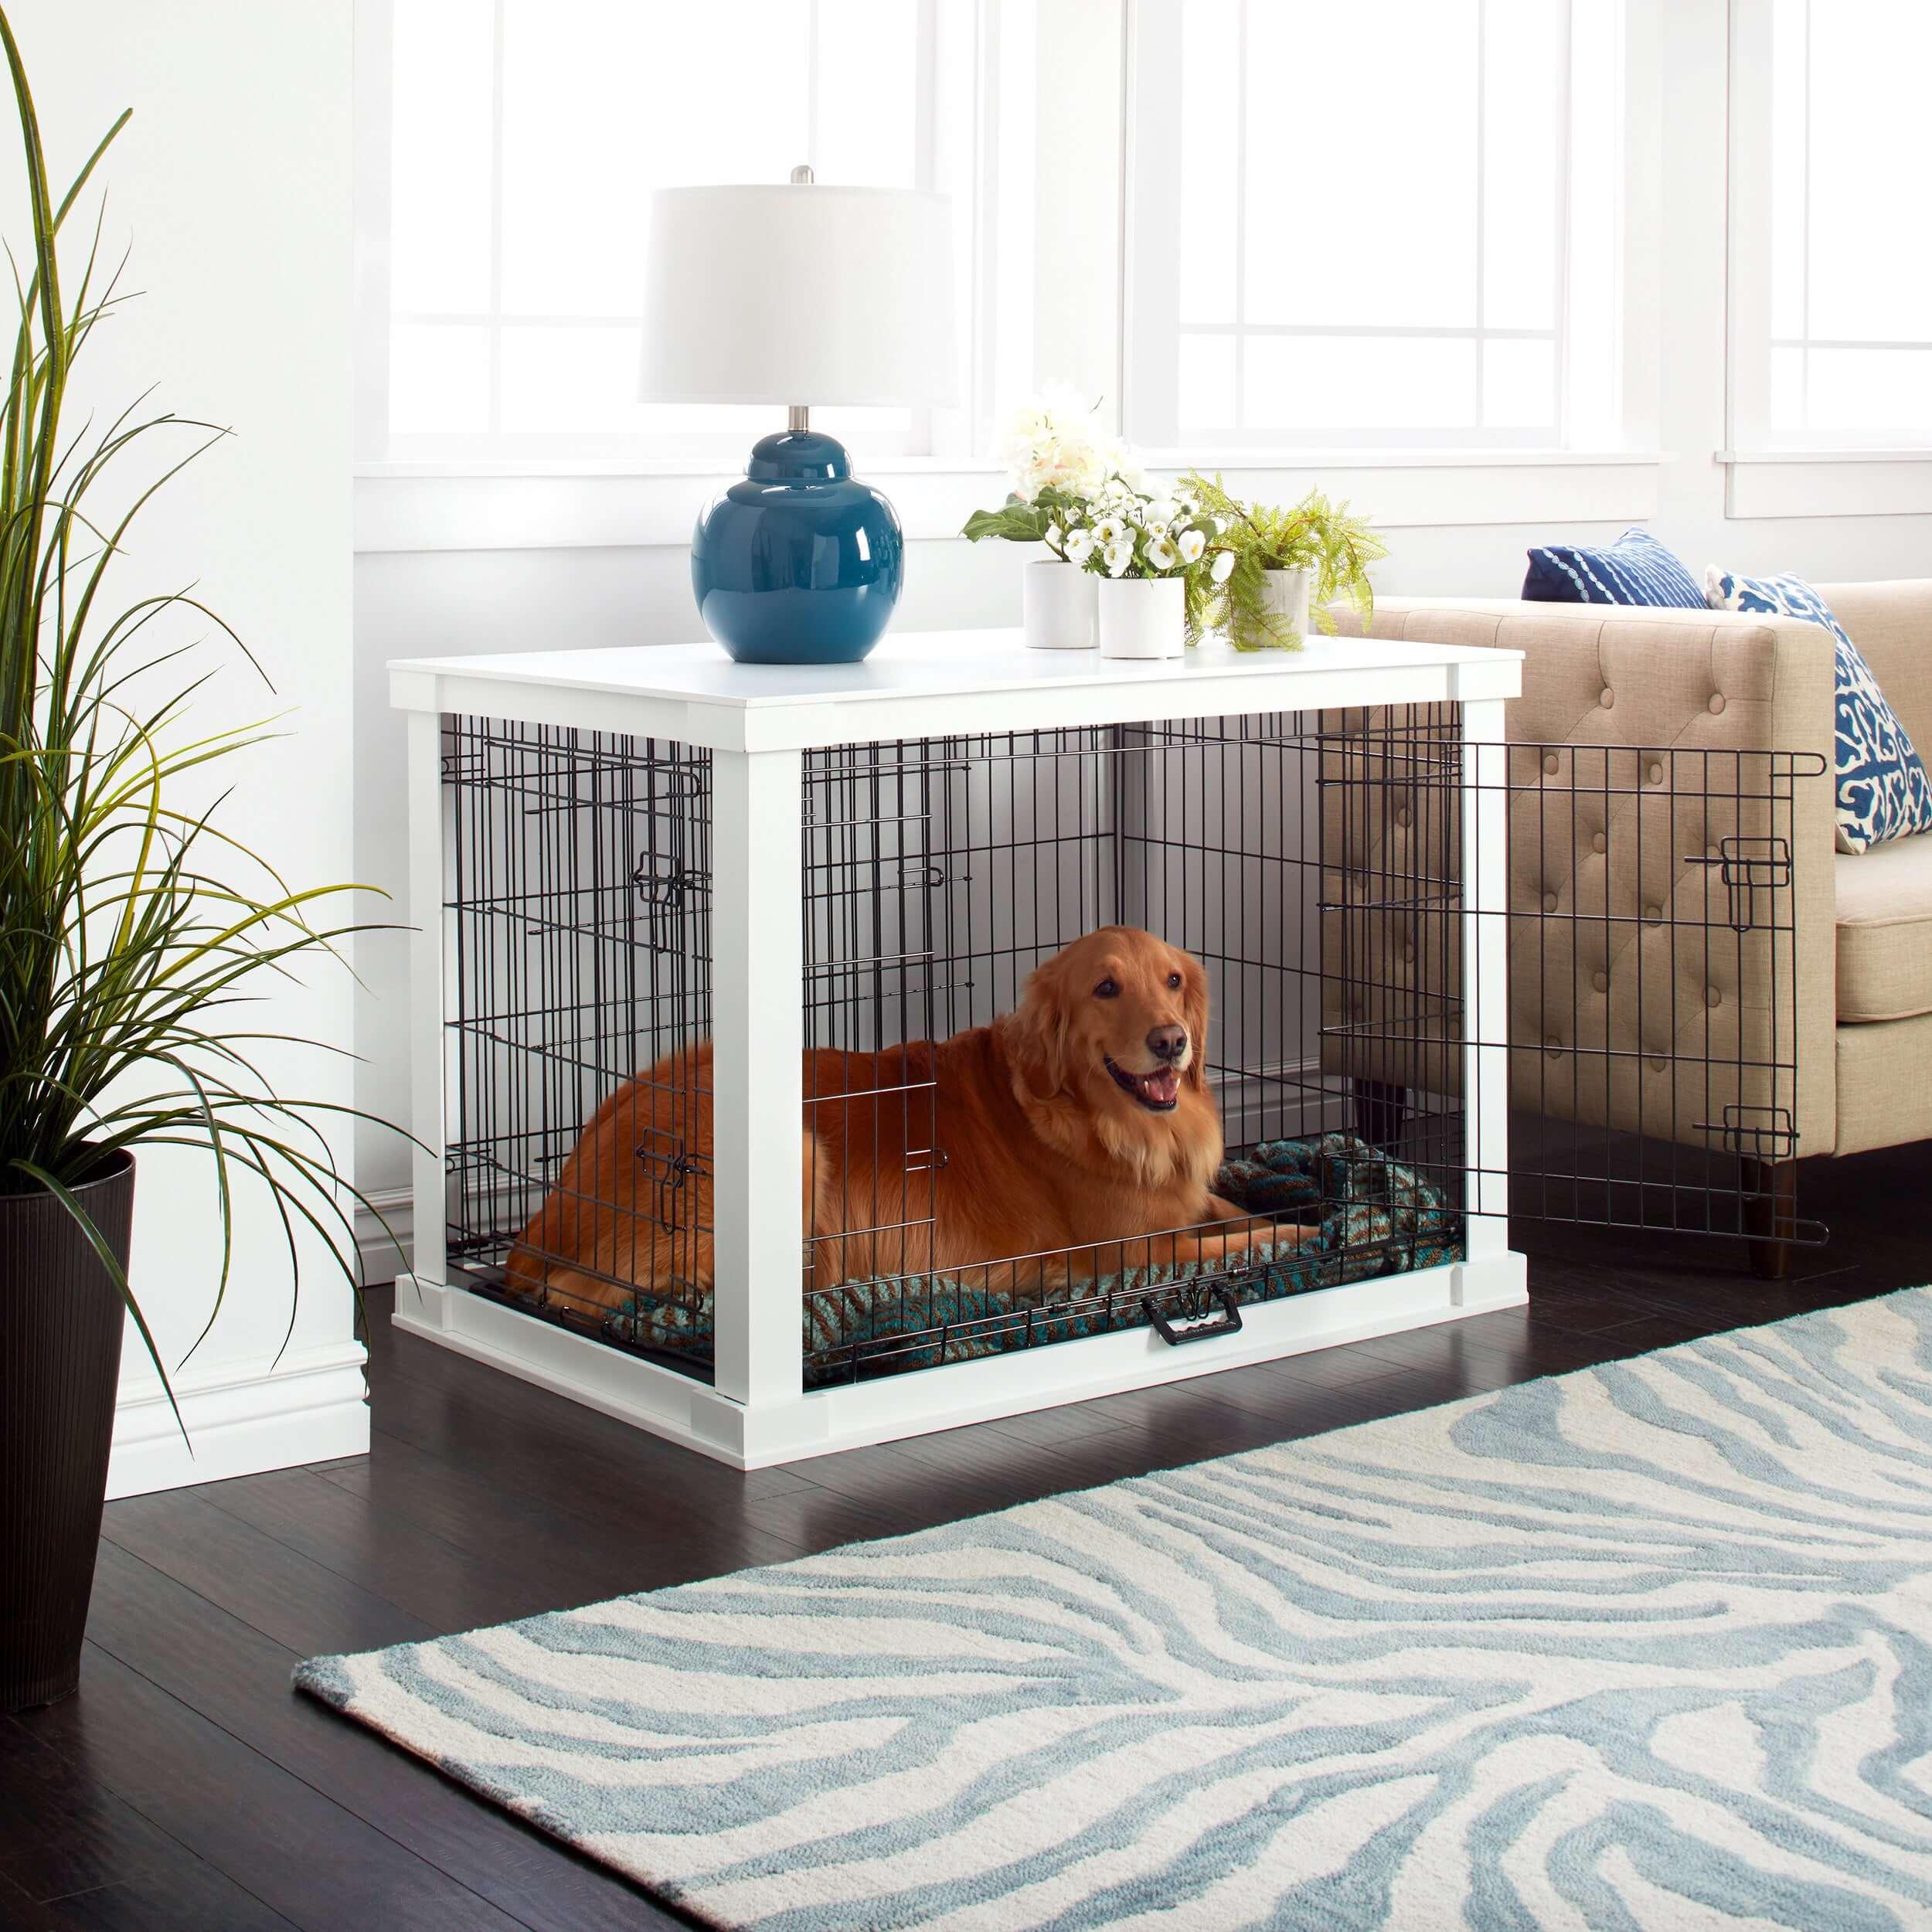 Anjing Golden : Karakter, Variasi Jenis, kelebihan & Harga (Update) 12